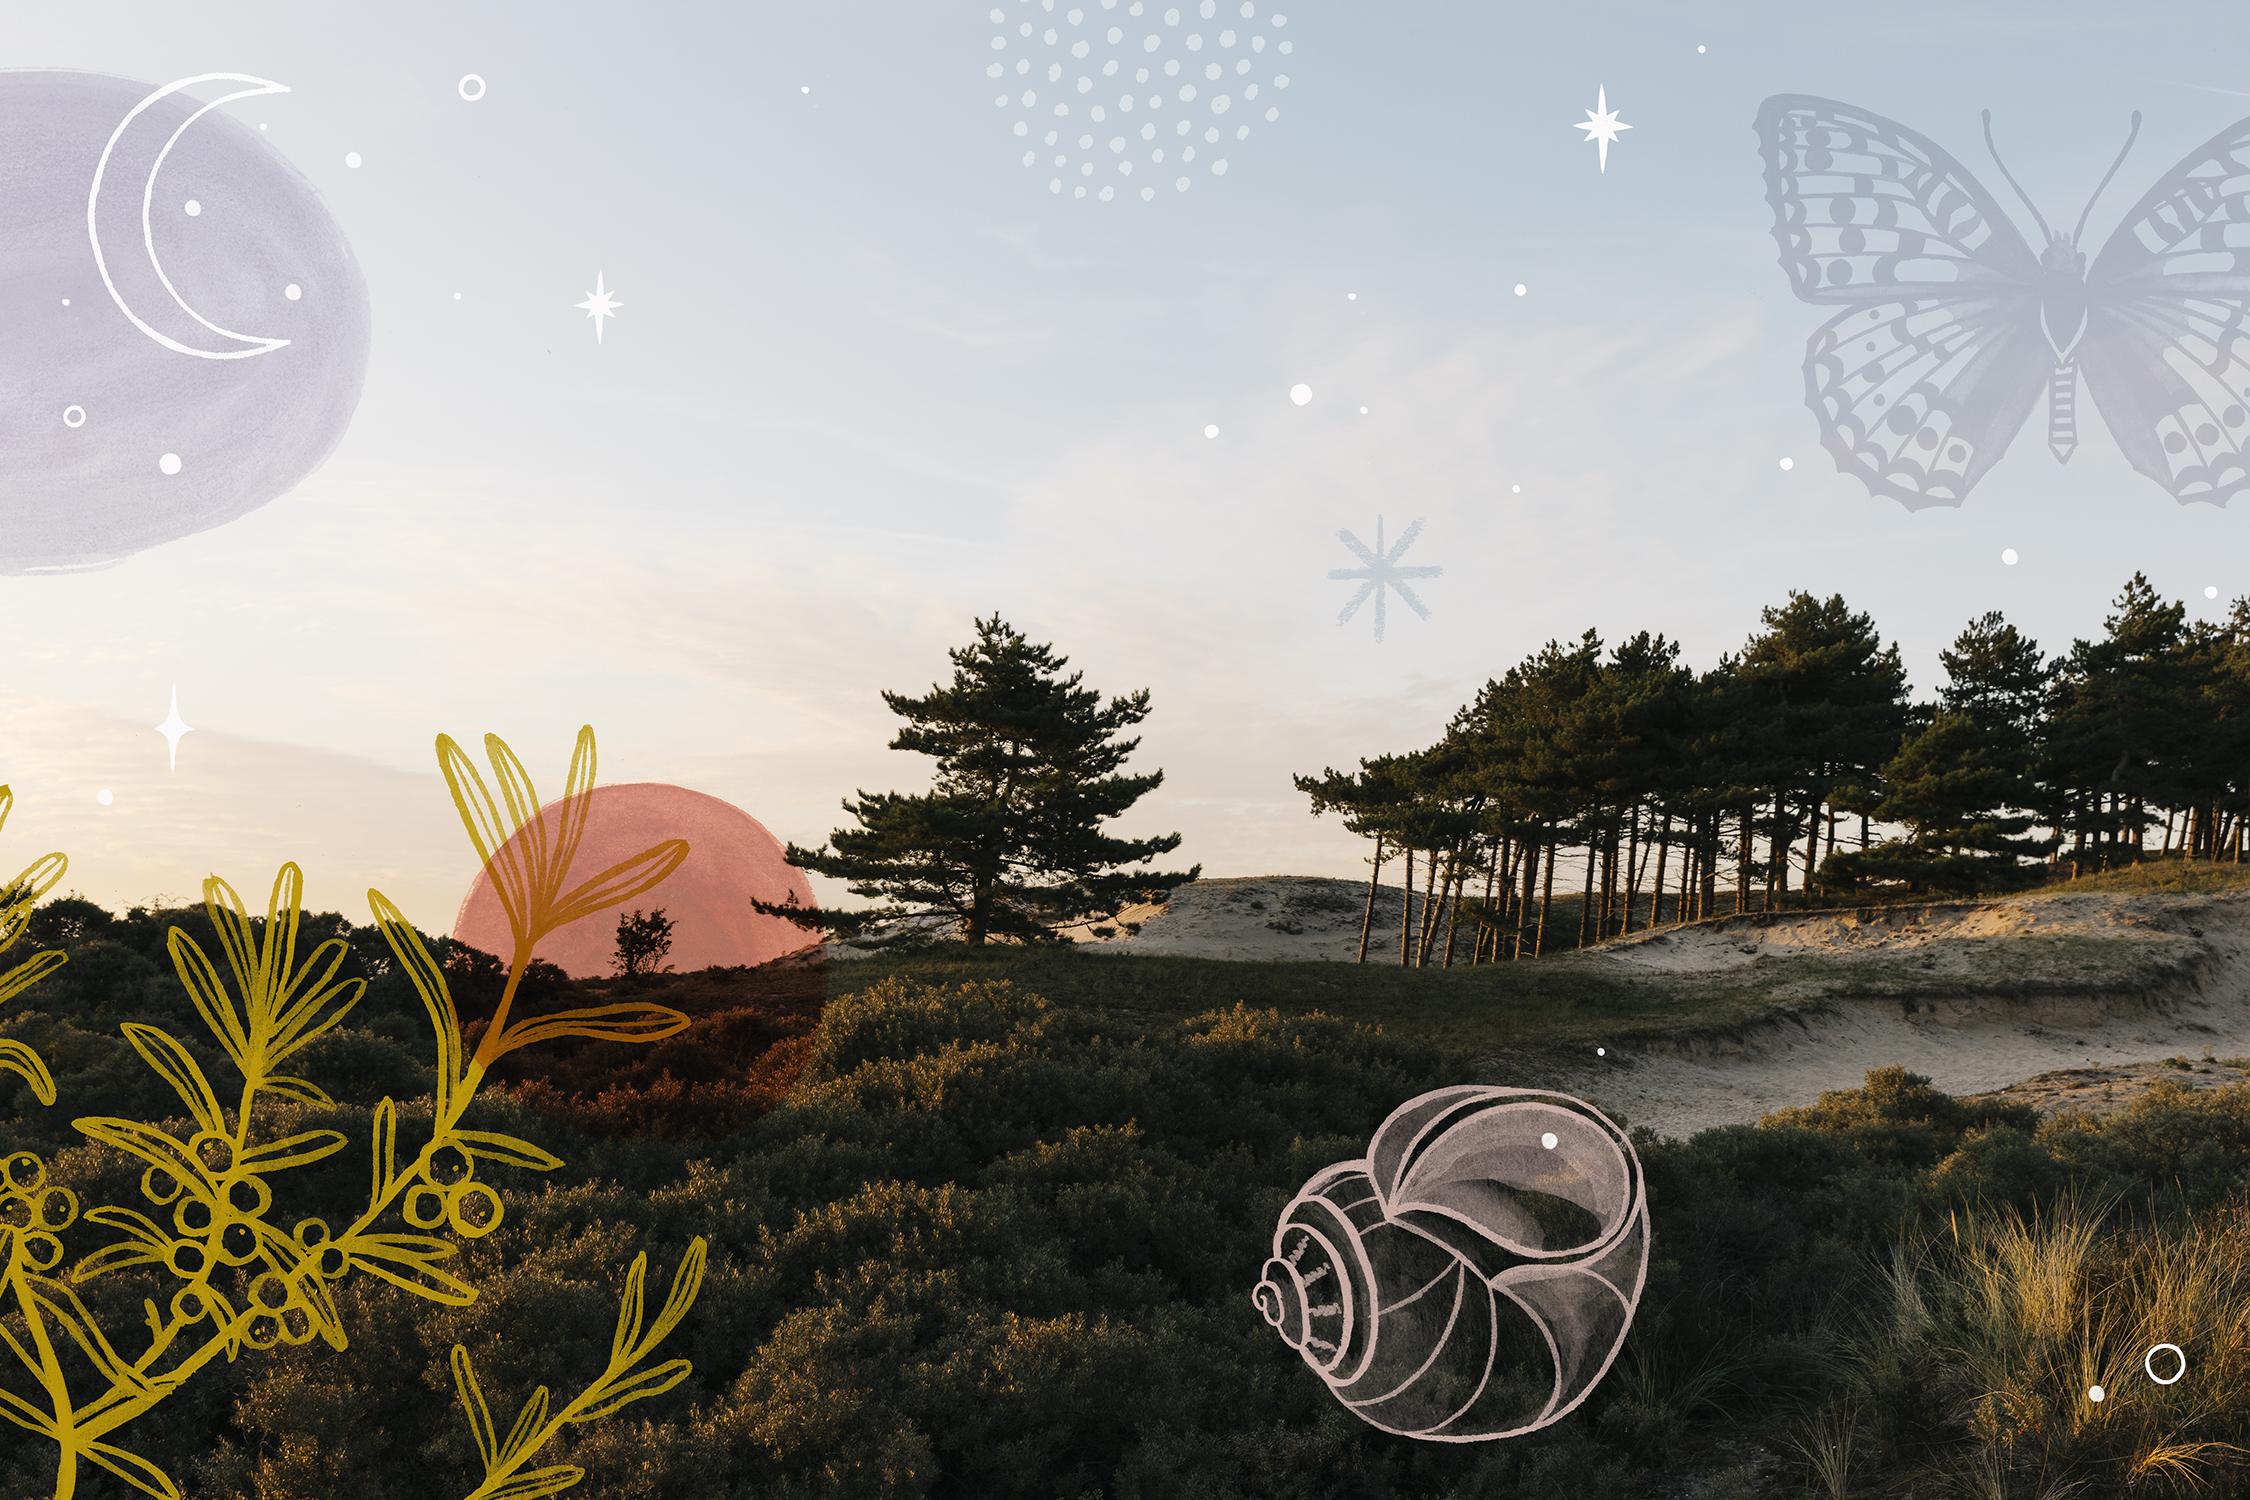 Adobe_Lewis_Landscape_Valesca_X_On_a_hazy_morning